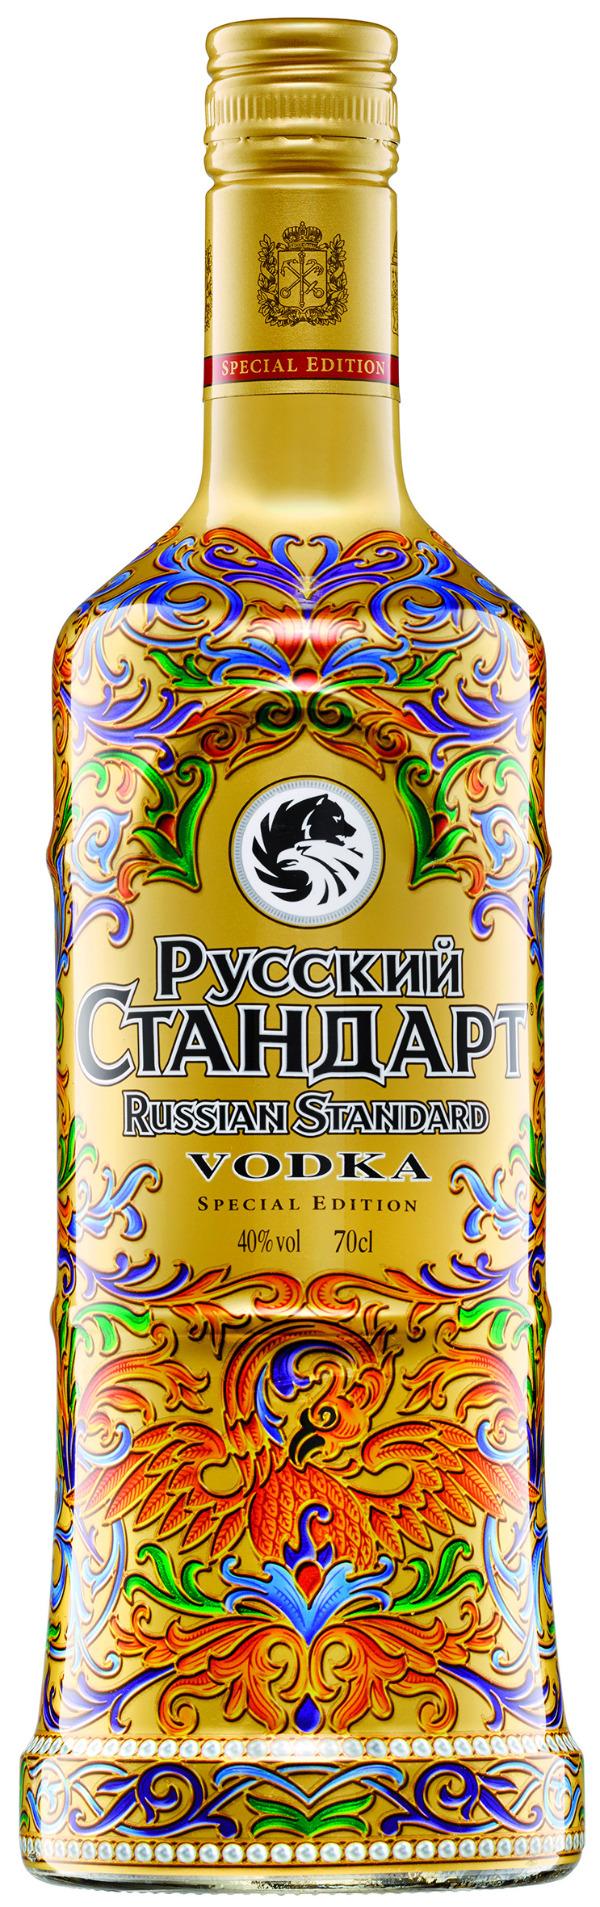 "Russian Standard Vodka Limited Edition: ""Lyubavin"" neu im Handel"